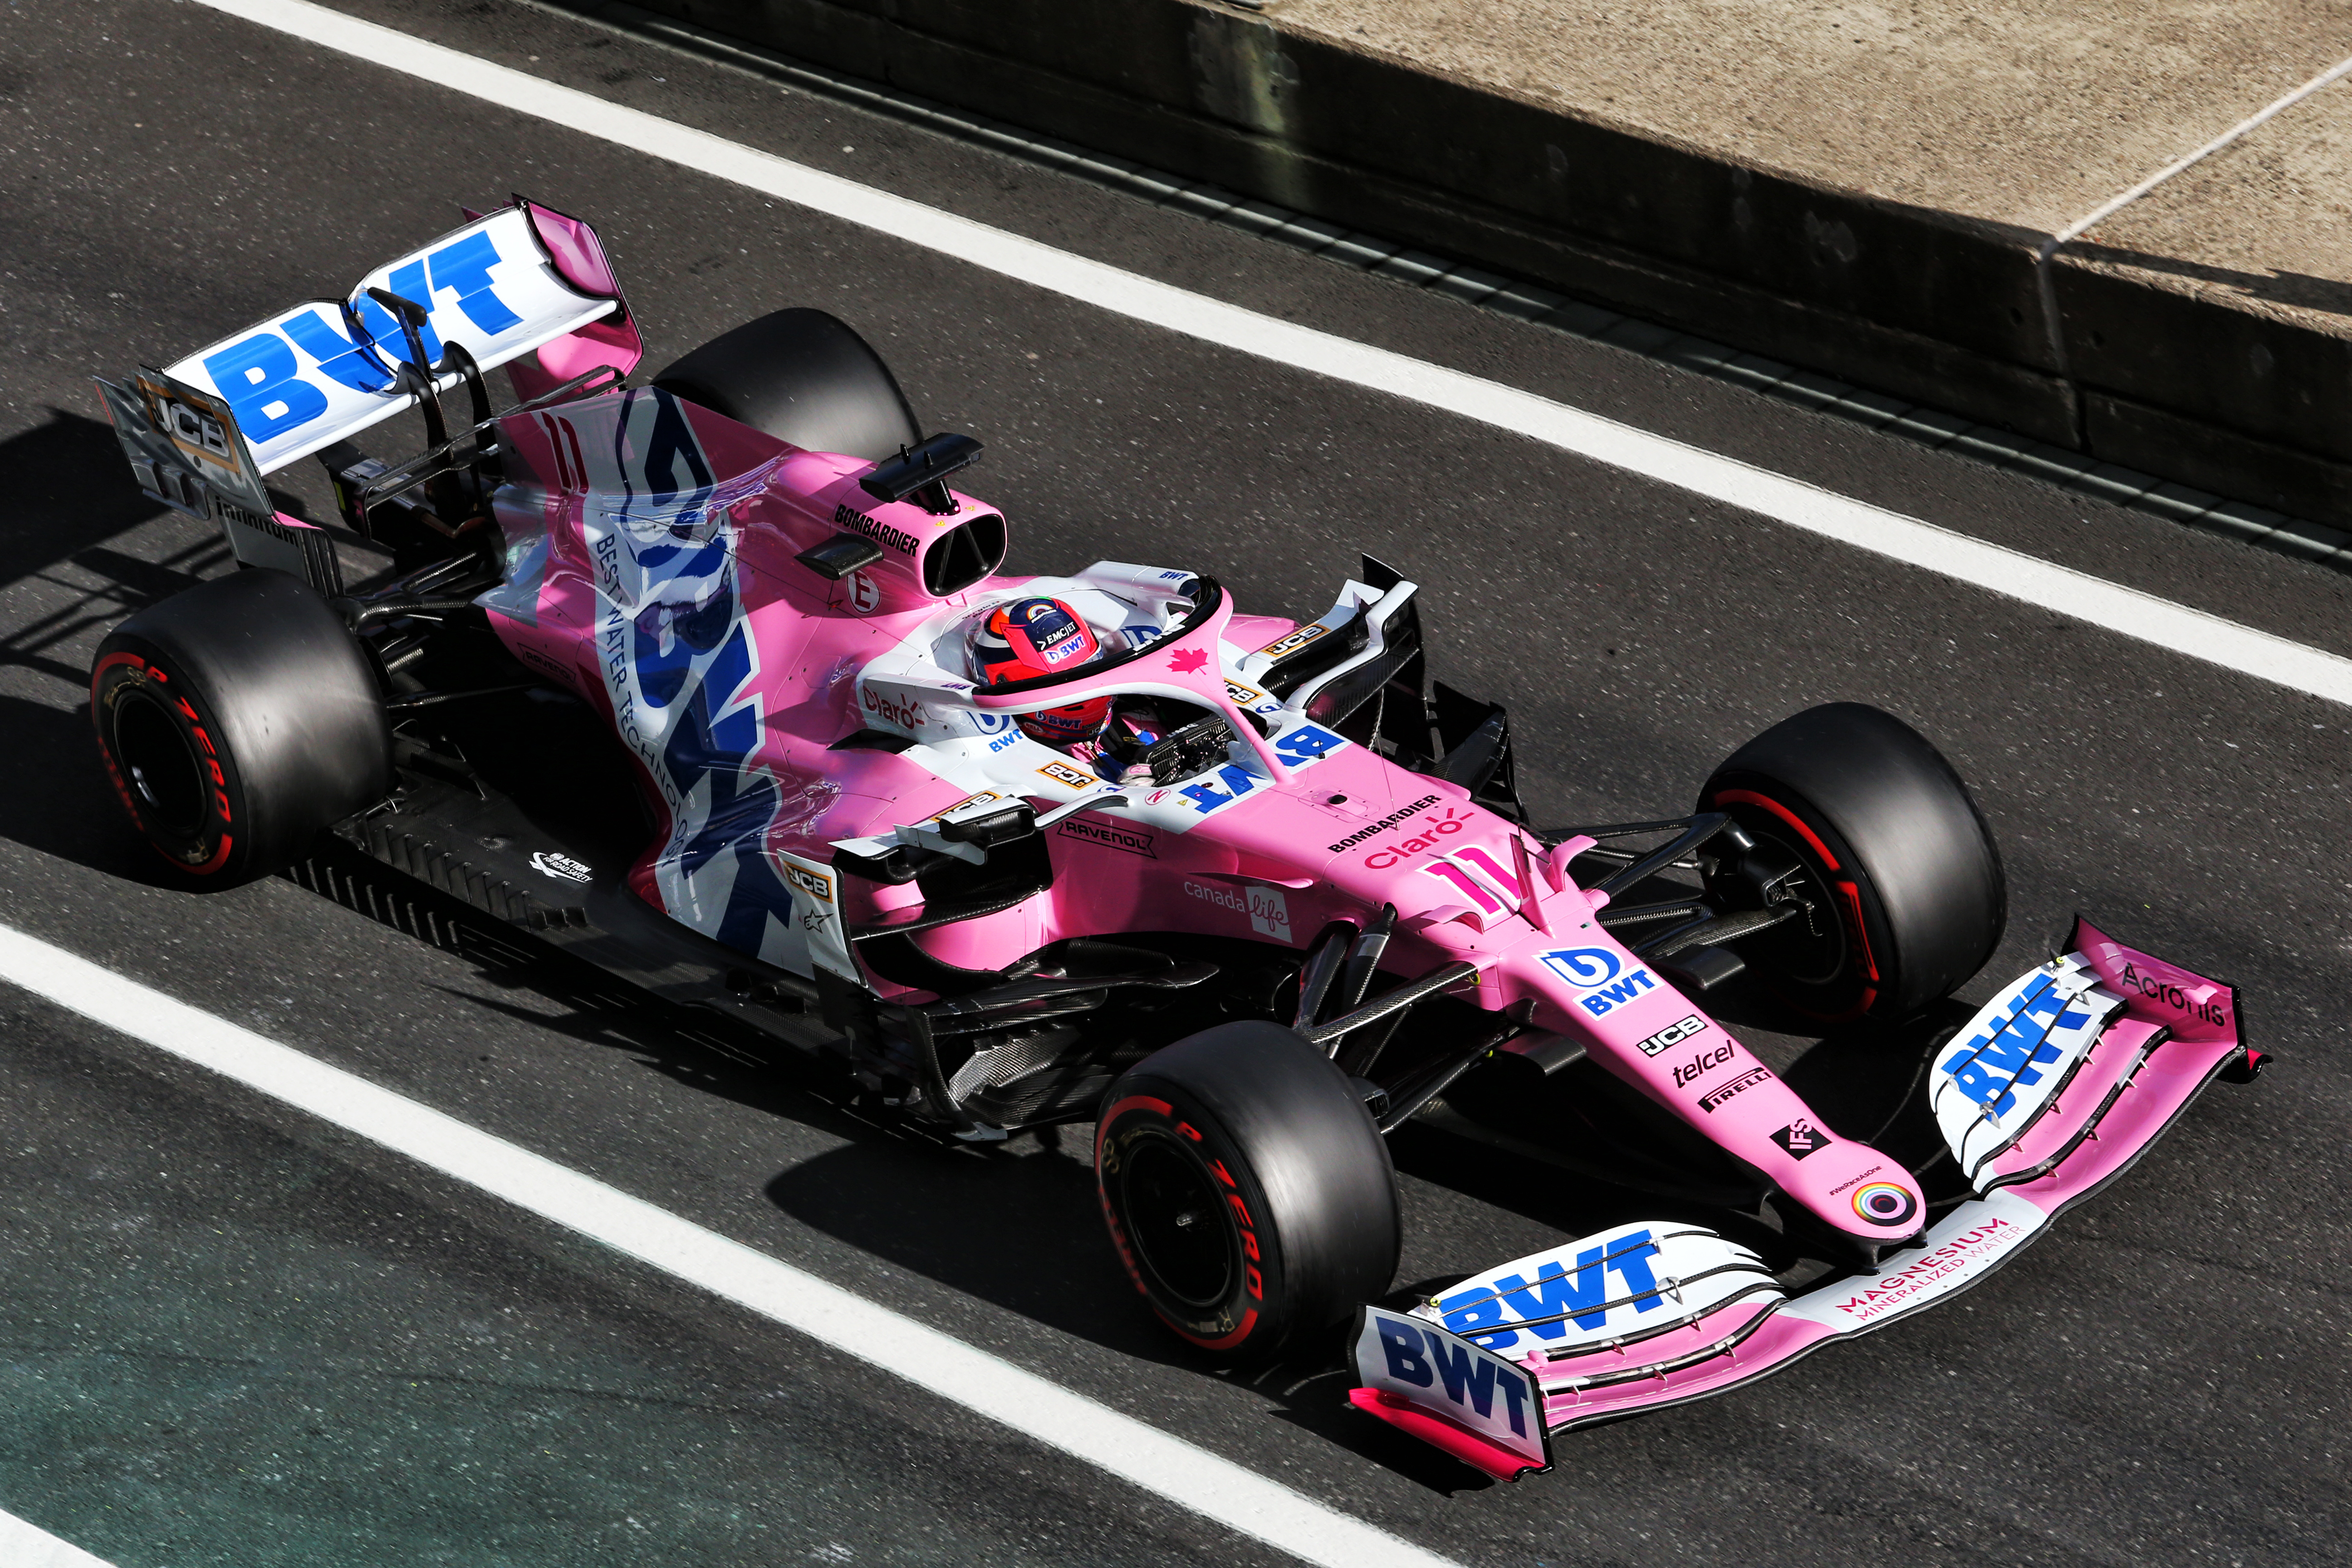 Sergio Perez Racing Point Eifel Grand Prix 2020 Nurburgring